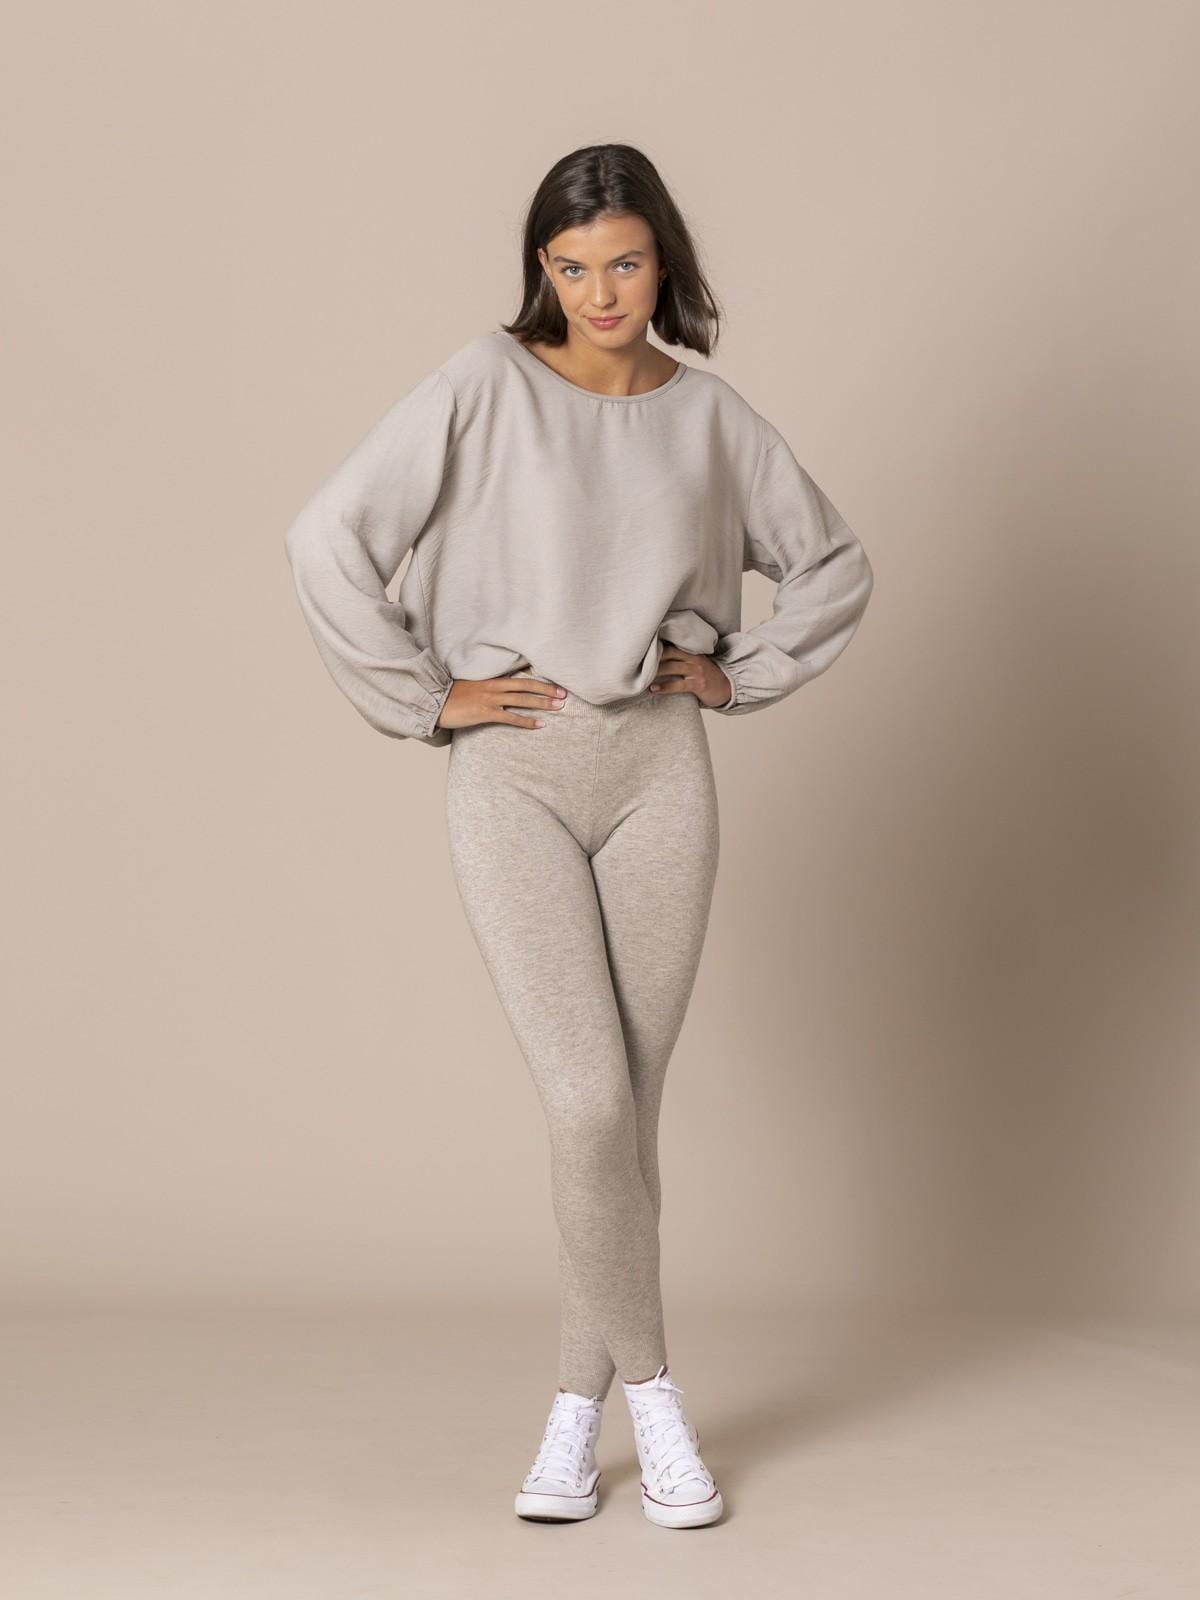 Woman Stretch low-knit trousers Beige